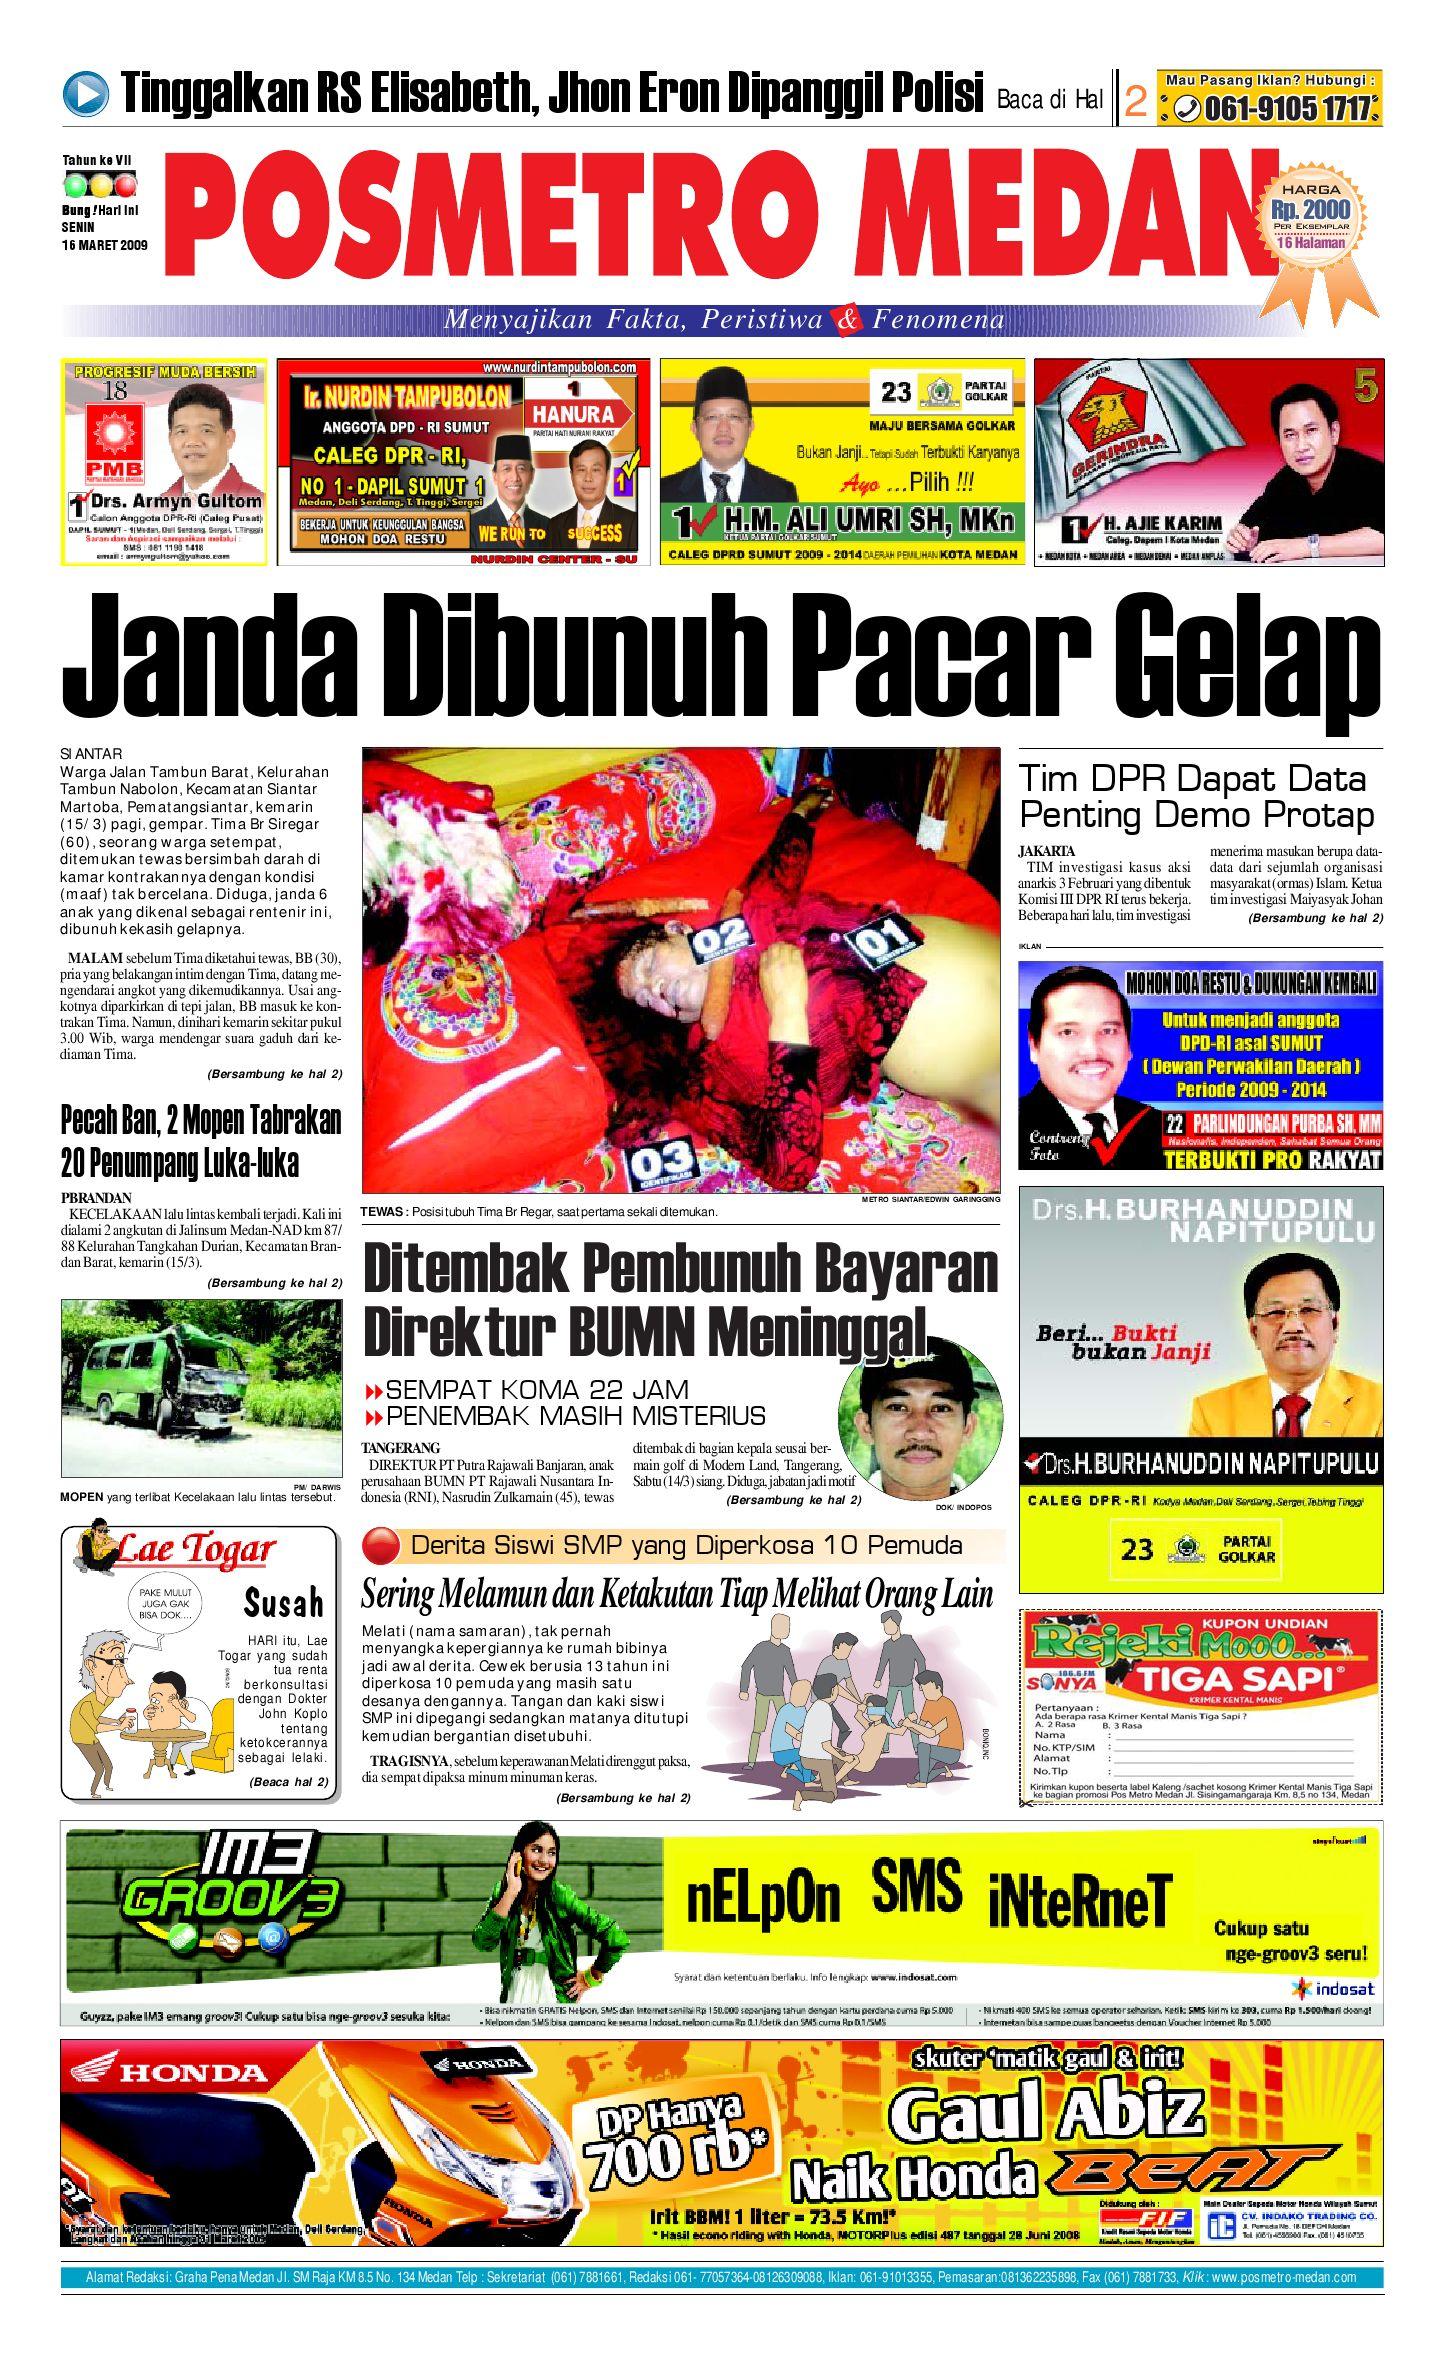 Posmetro Medan By Simon Sinaga Issuu Tcash Vaganza 17 Samsung Adaptor Fast Charging Kualitas Original Putih